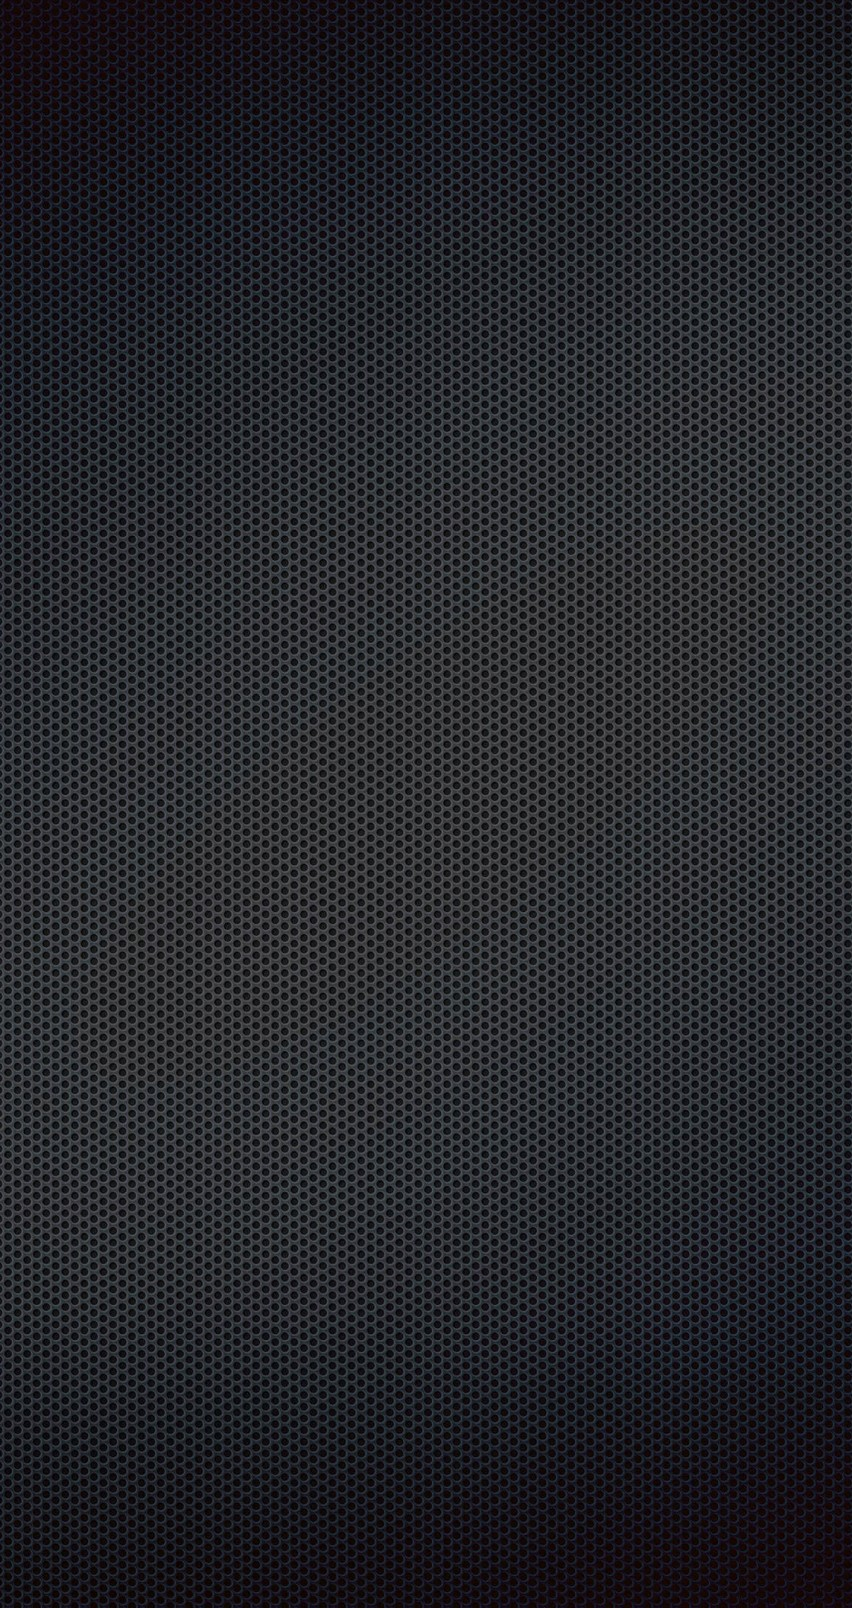 Black Grill Texture HD wallpaper for iPhone 6   HDwallpapersnet 852x1608